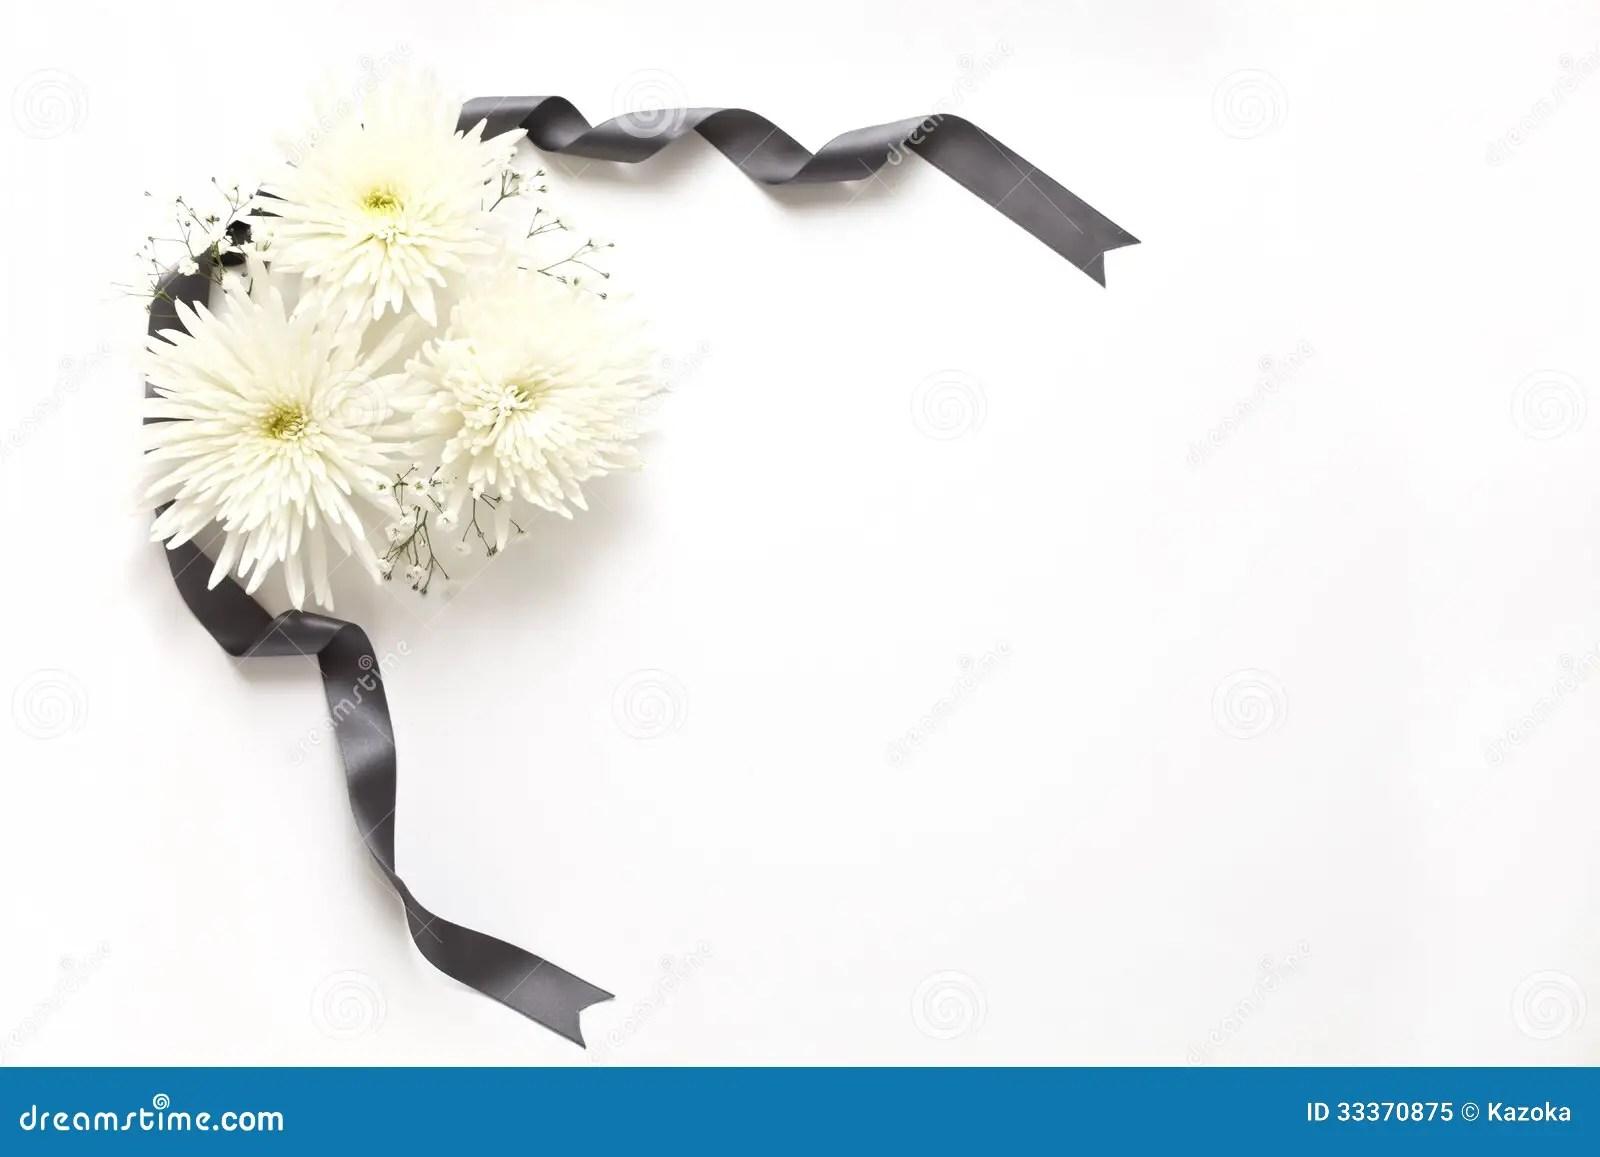 Funeral Program Clip Art Headstone